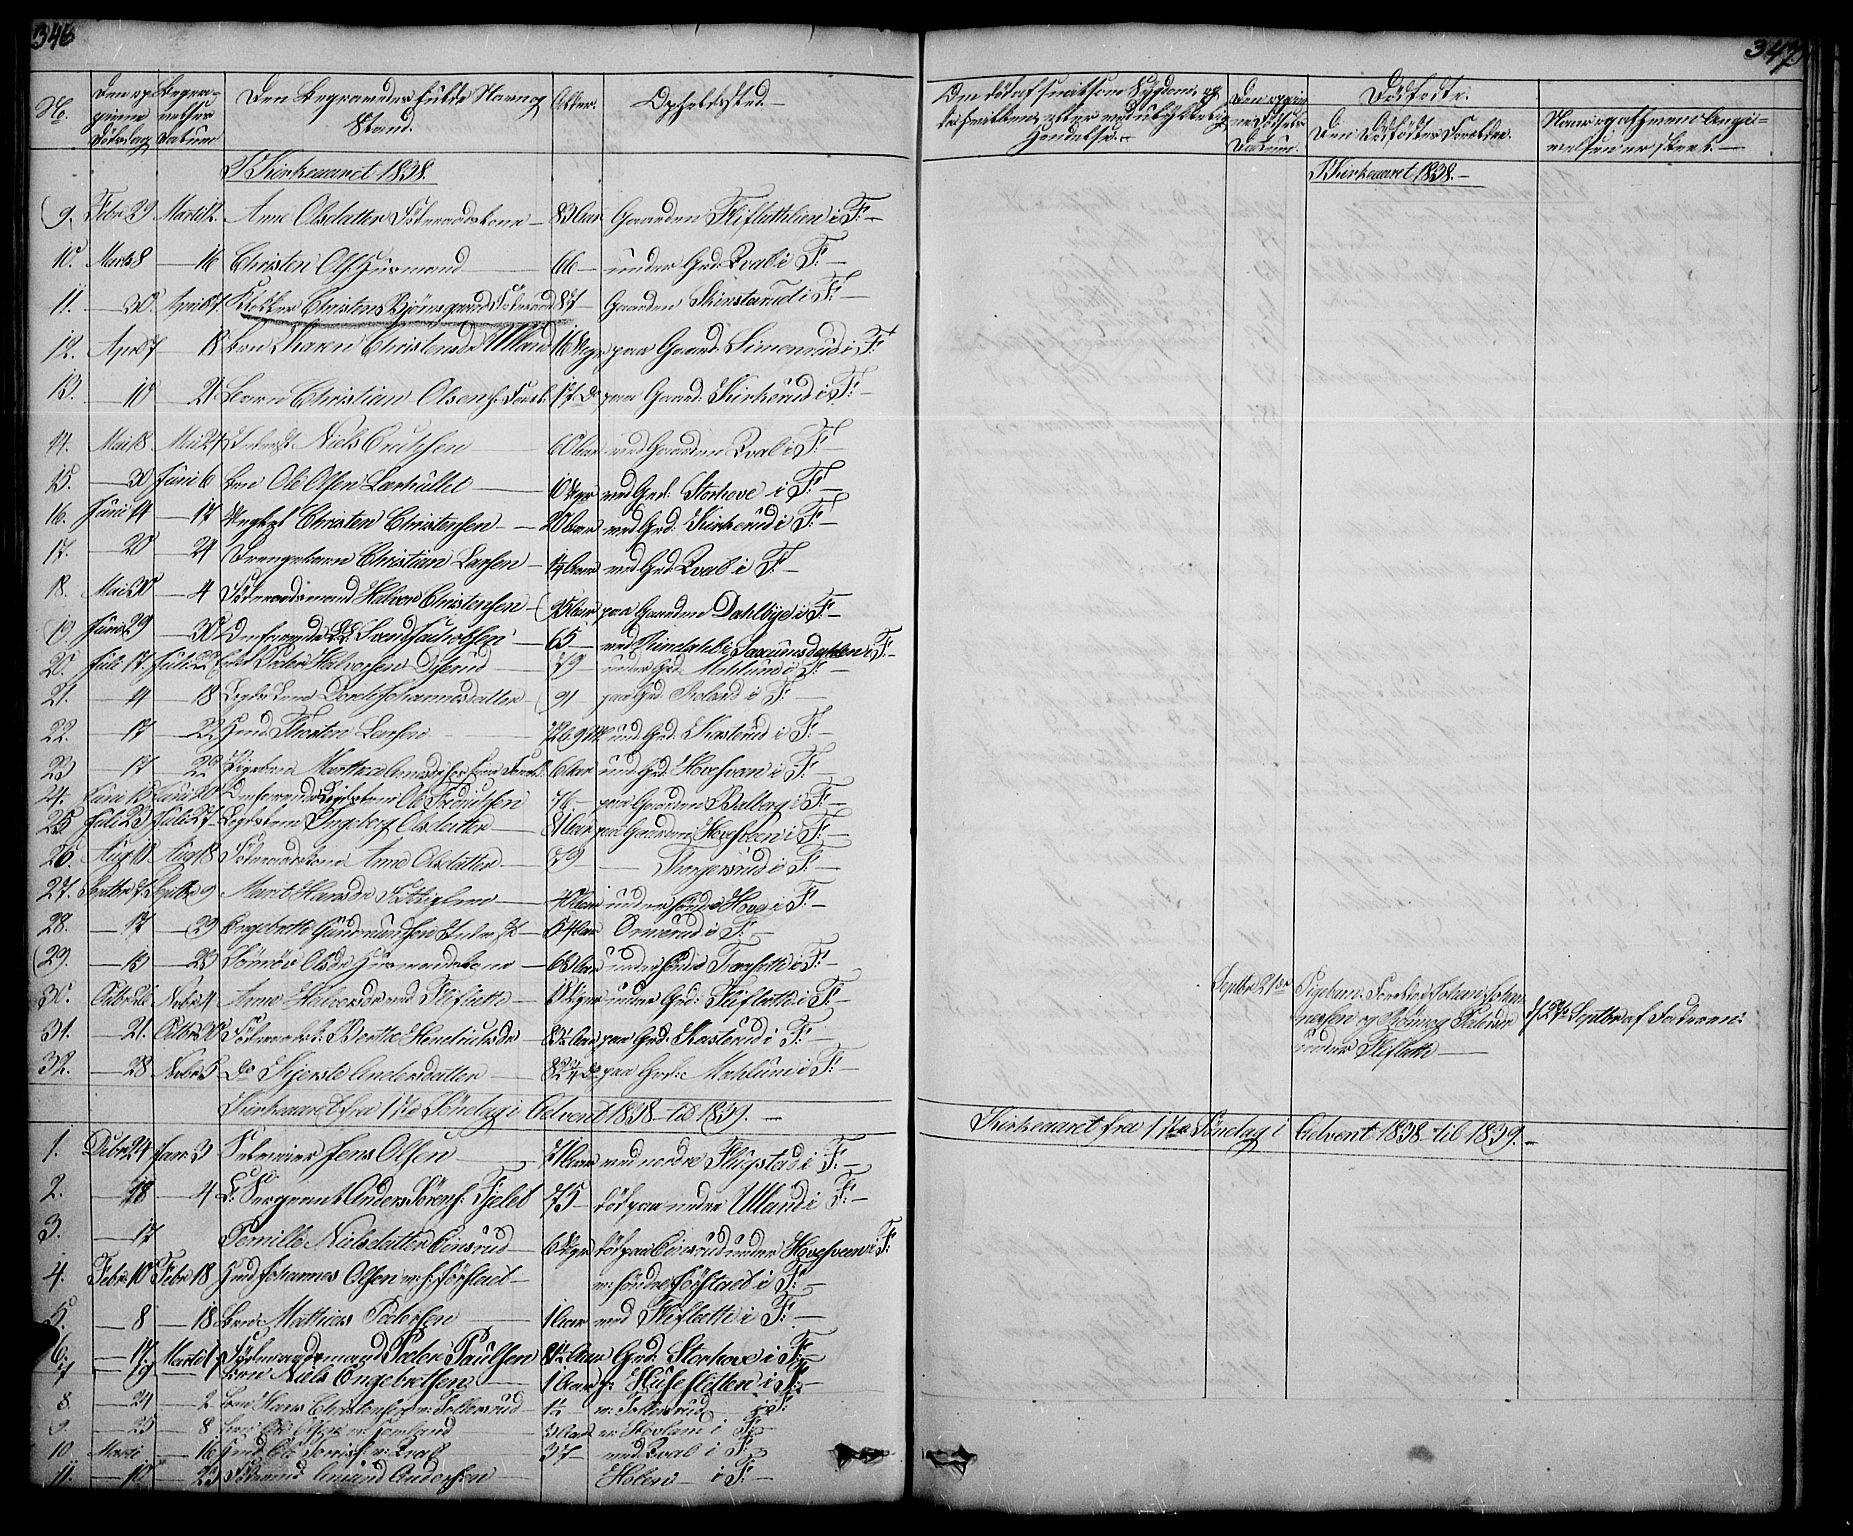 SAH, Fåberg prestekontor, Klokkerbok nr. 5, 1837-1864, s. 346-347